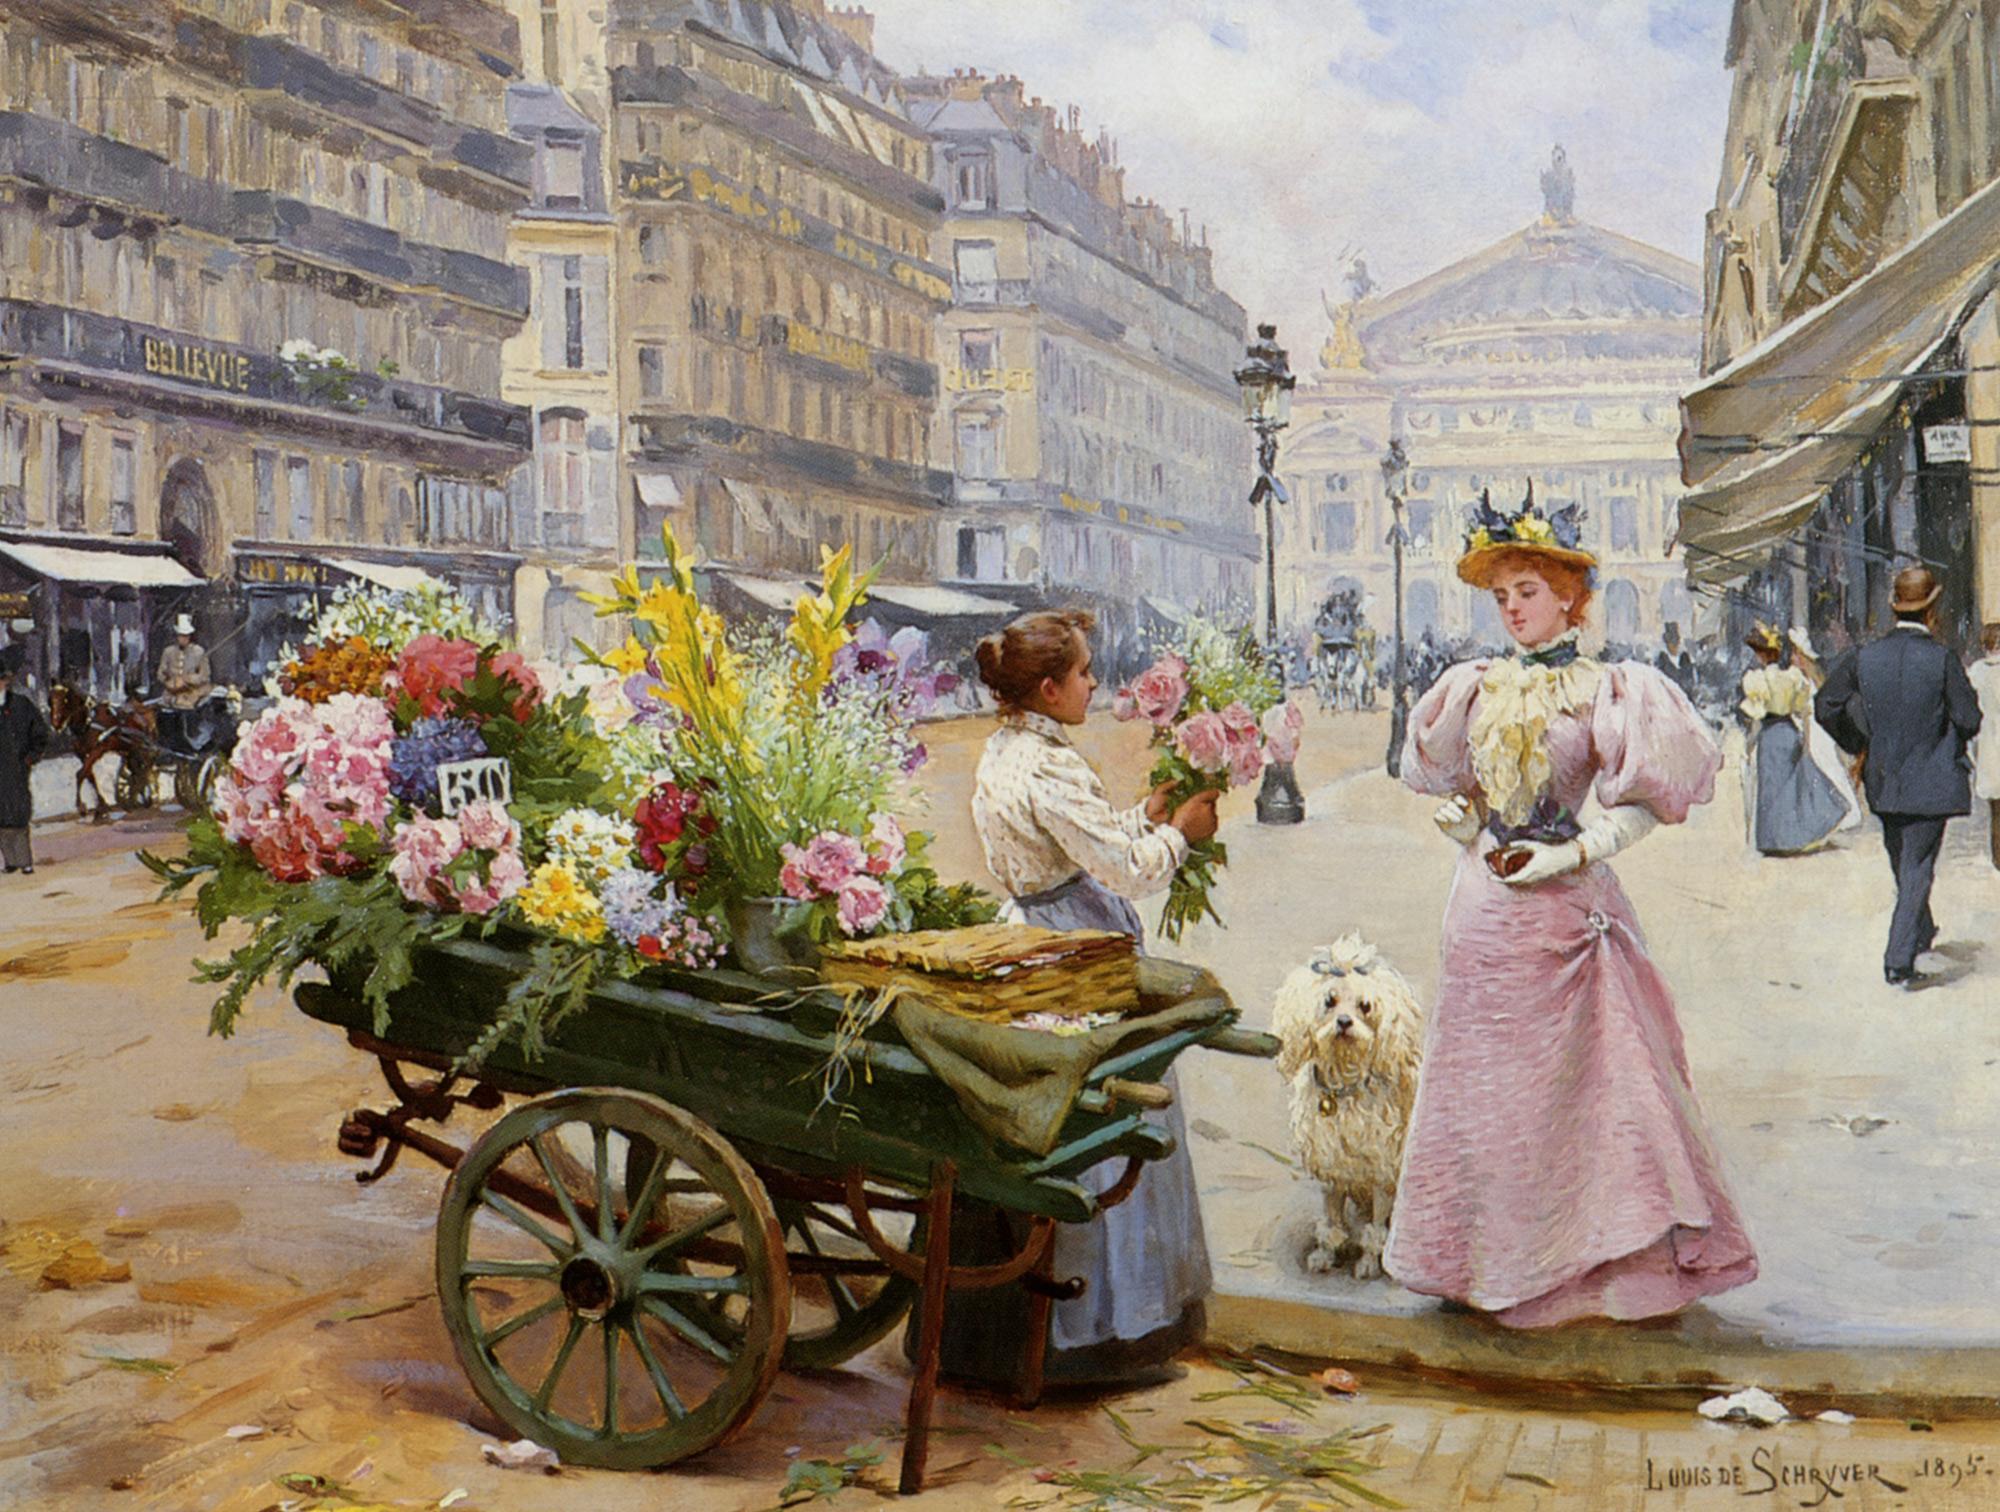 Mary at the flower merchant :: Louis Marie de Schryver - Street and market genre scenes ôîòî